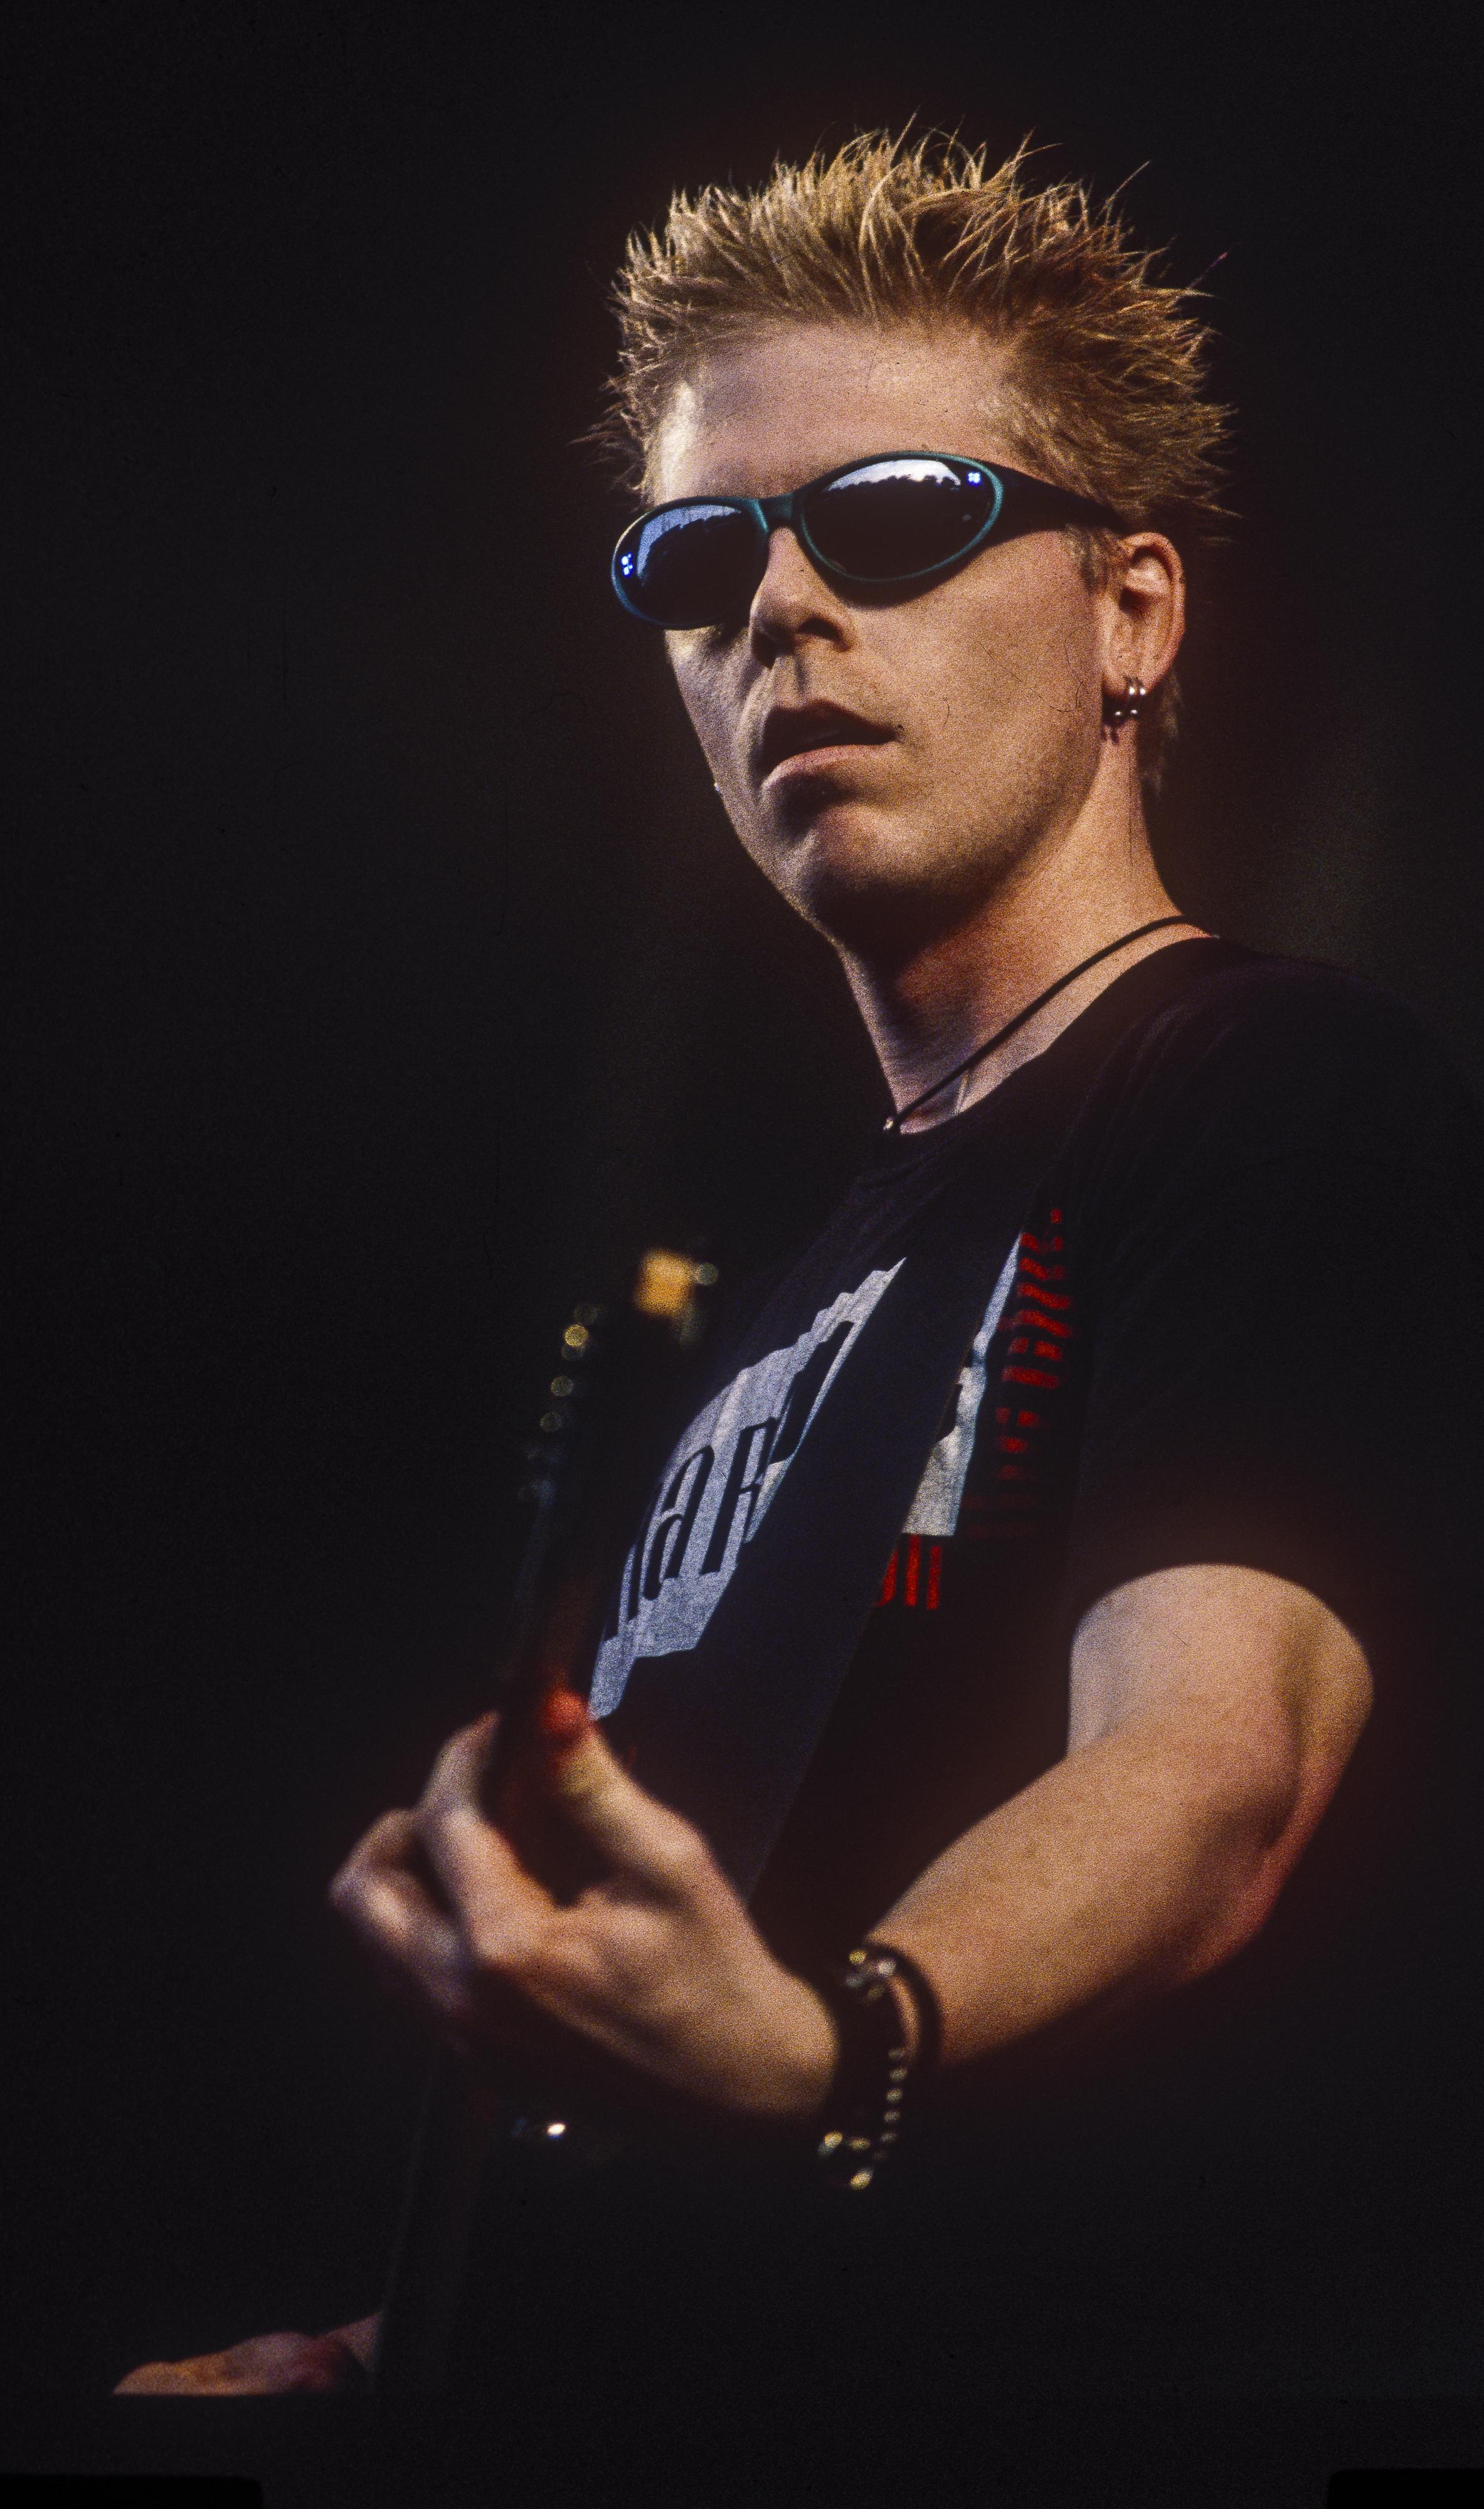 Dexter Holland, The Offspring at Livid '96